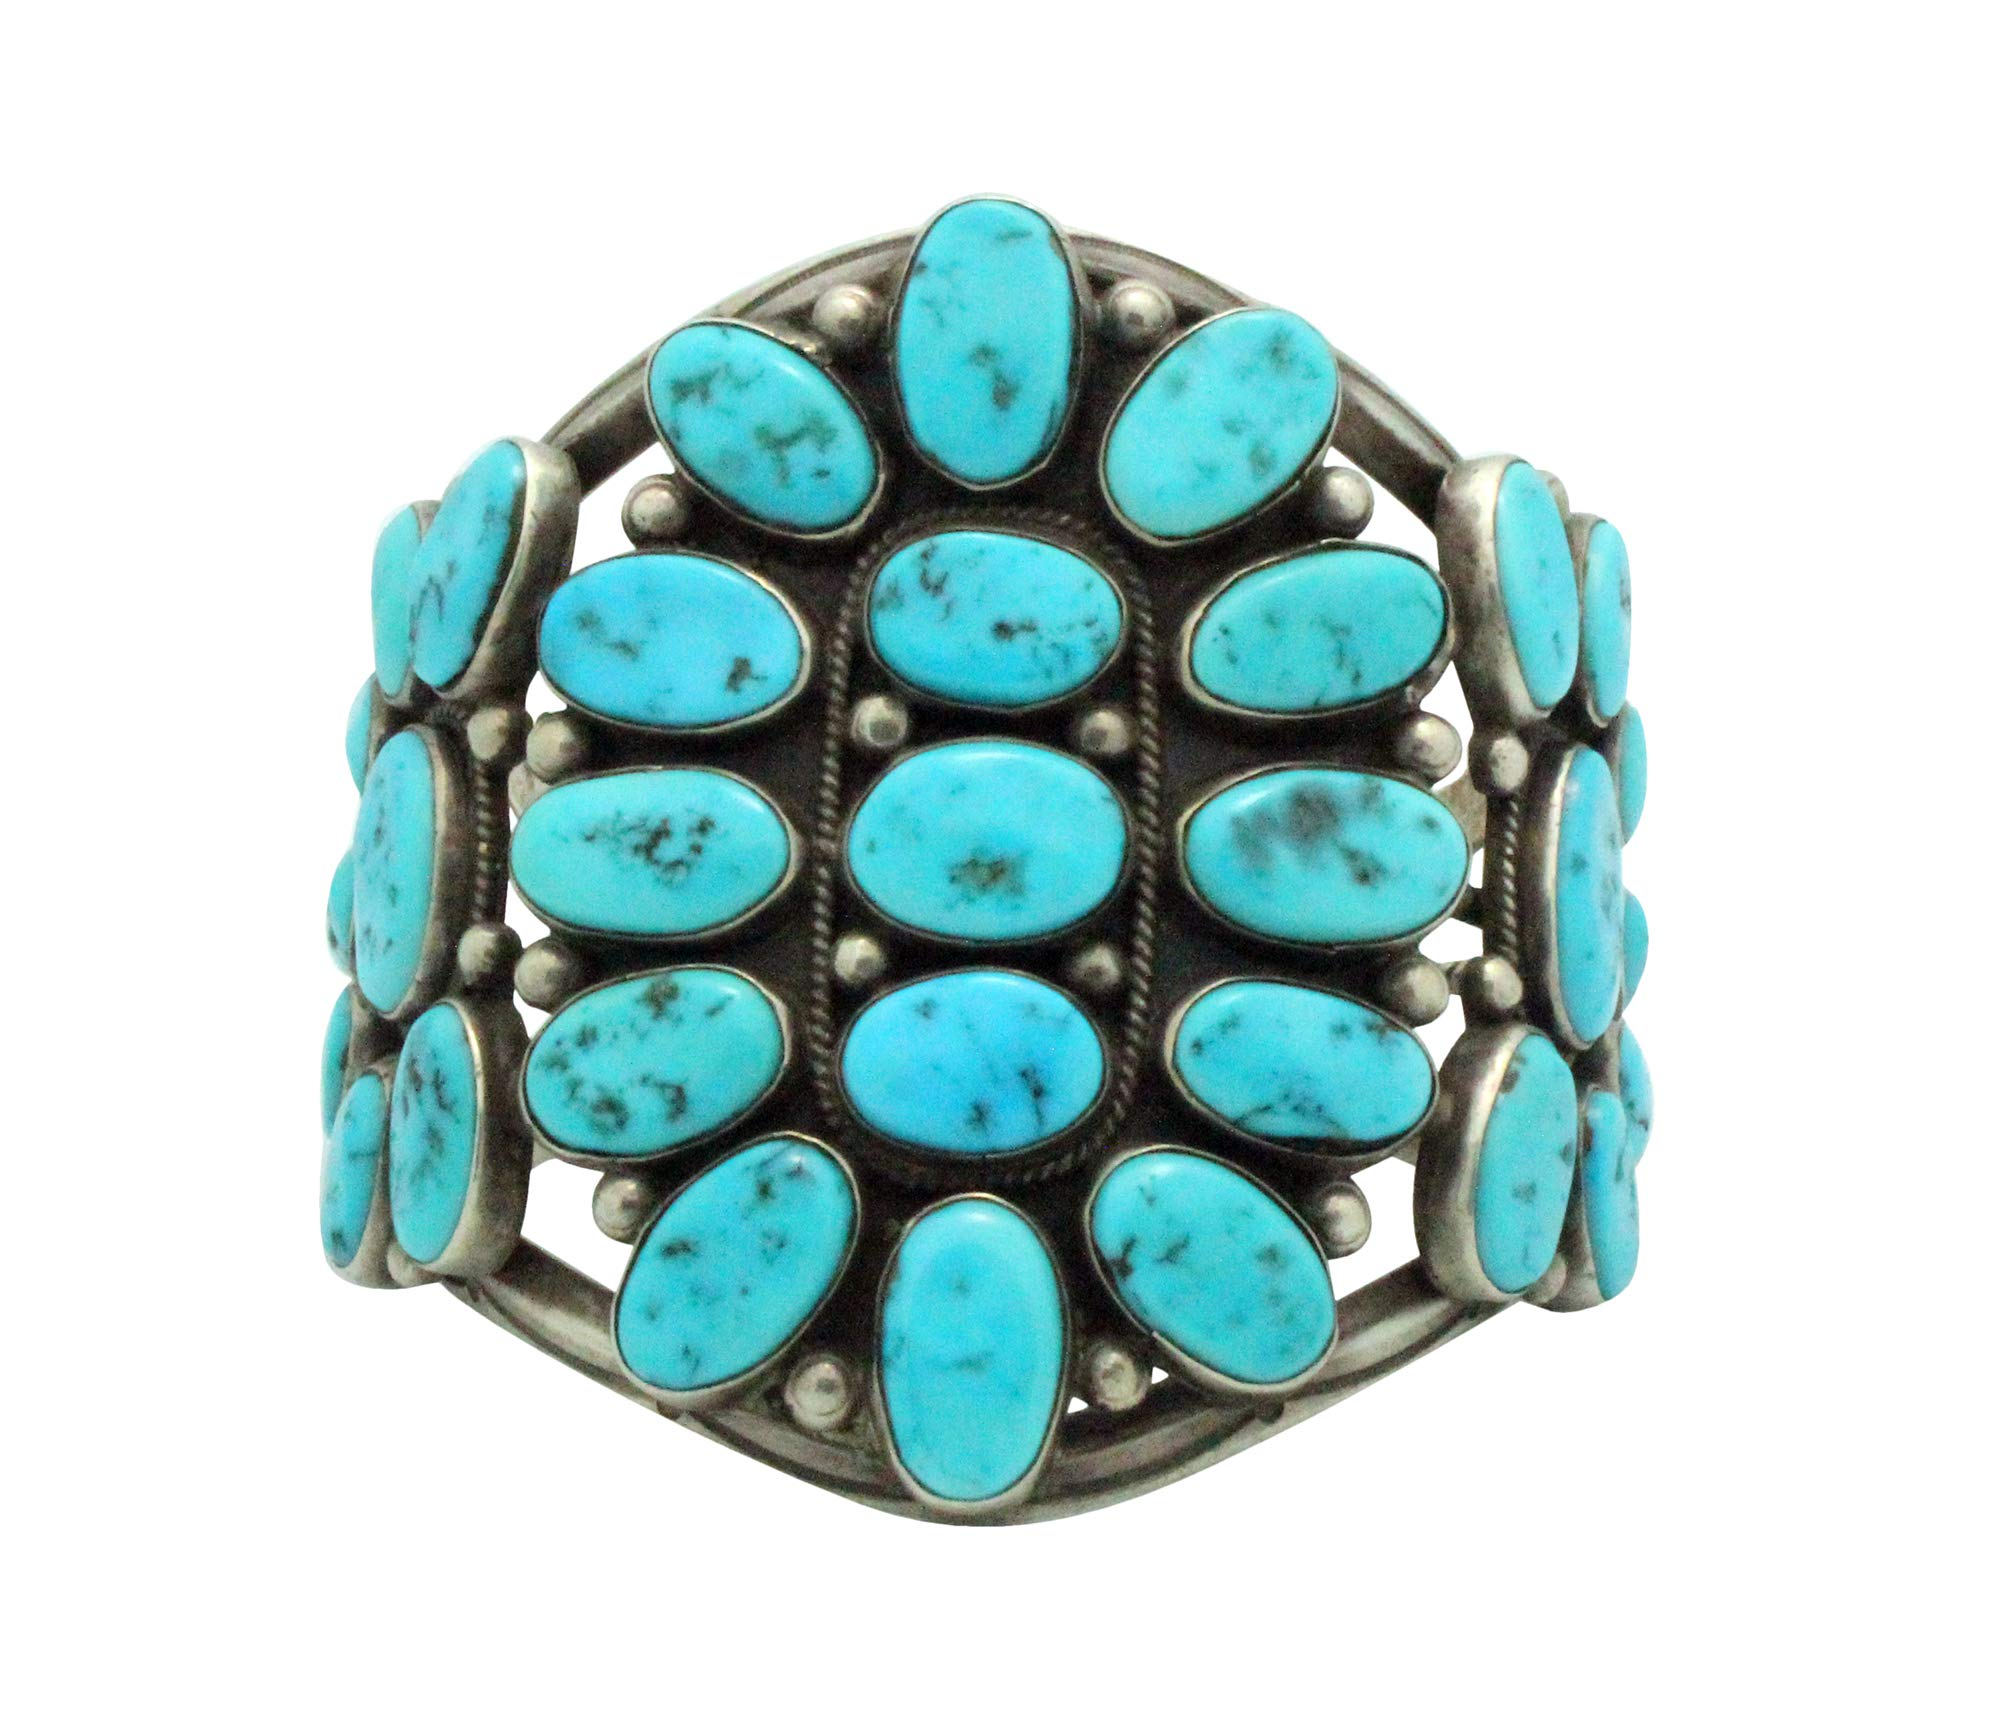 Hoskie Jim, Bracelet, Sleeping Beauty Turquoise, Circa 1980s, Navajo Made, 6.5